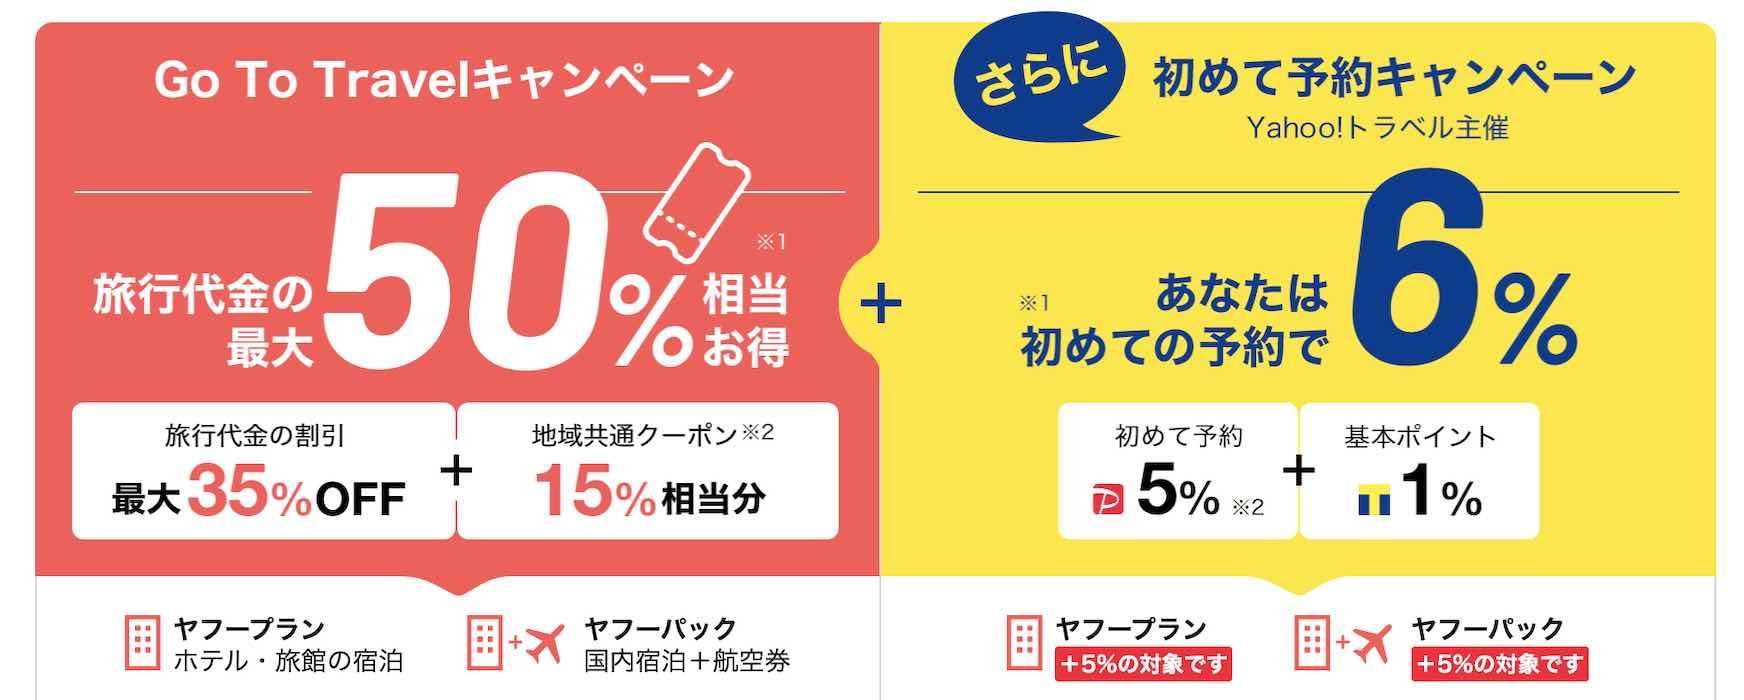 Yahoo!トラベルキャンペーン1